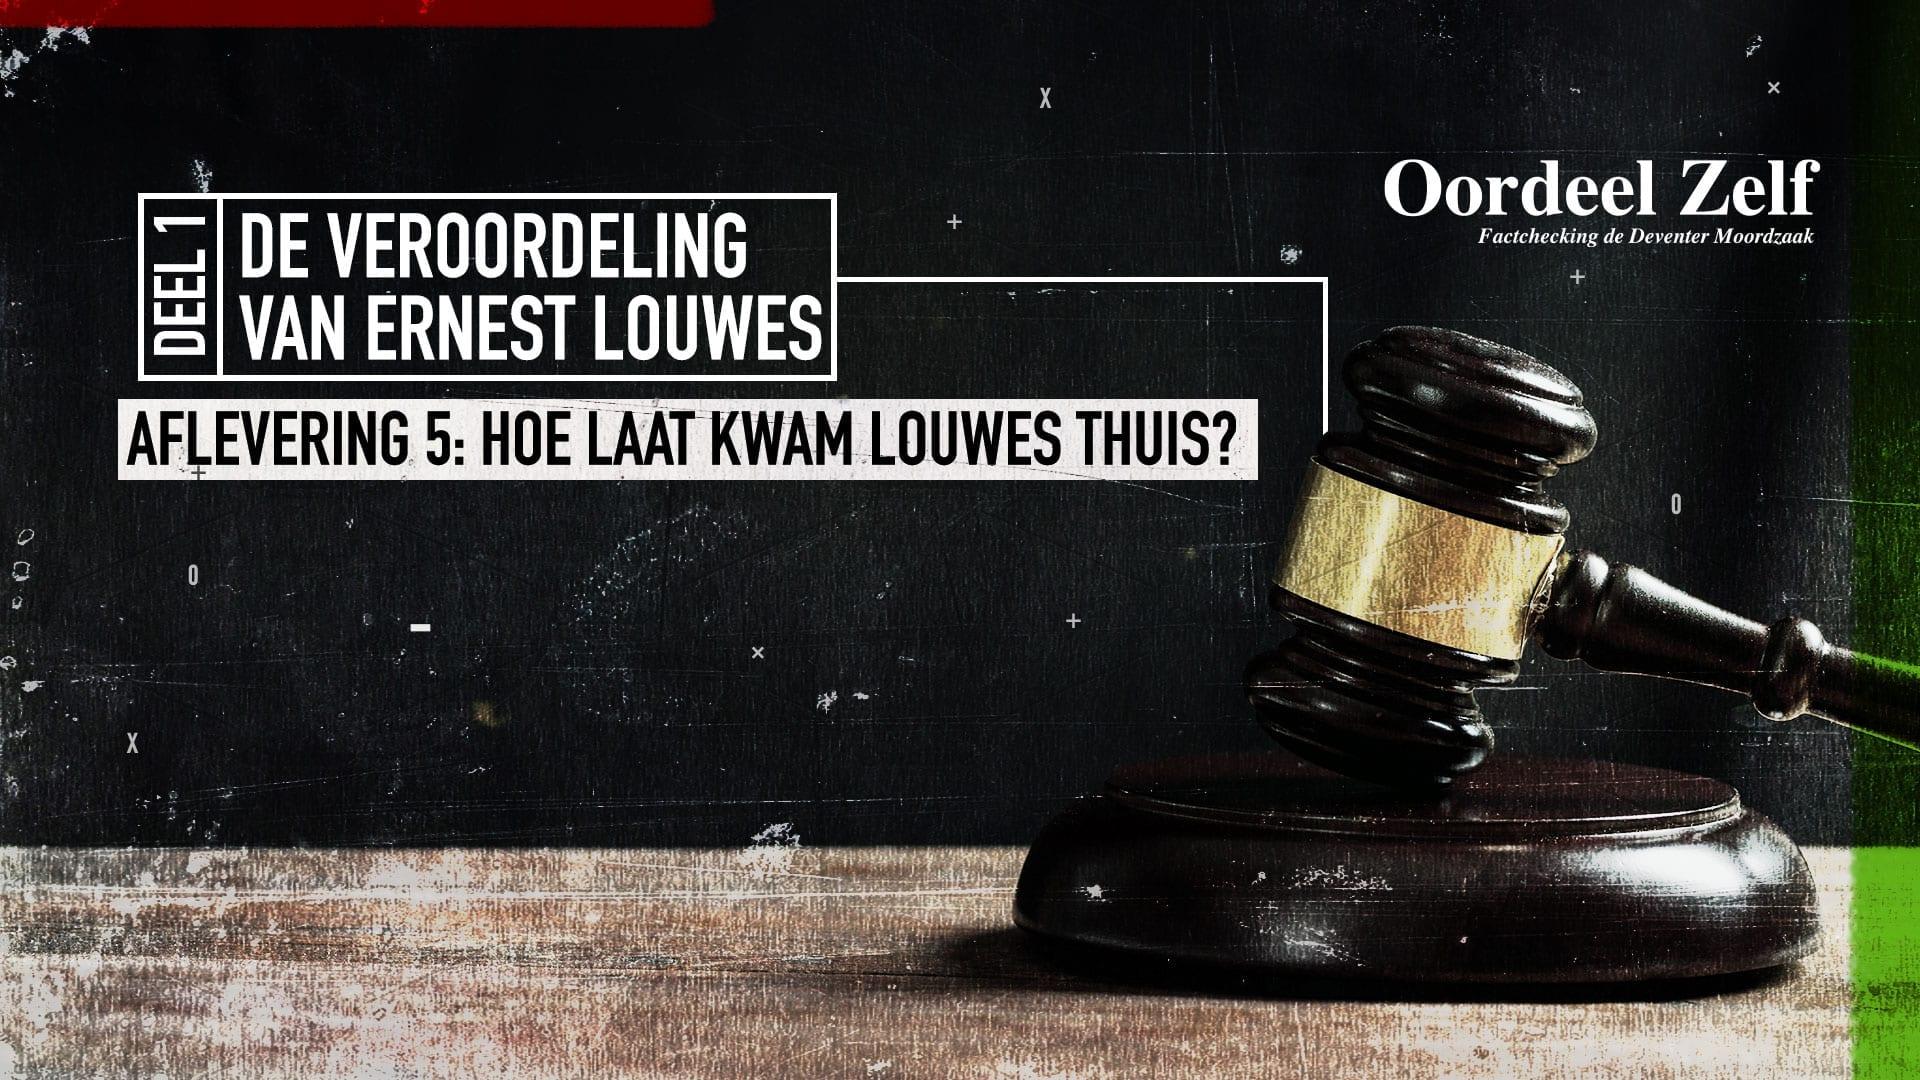 Aflevering 5-Hoe laat kwam Louwes thuis?